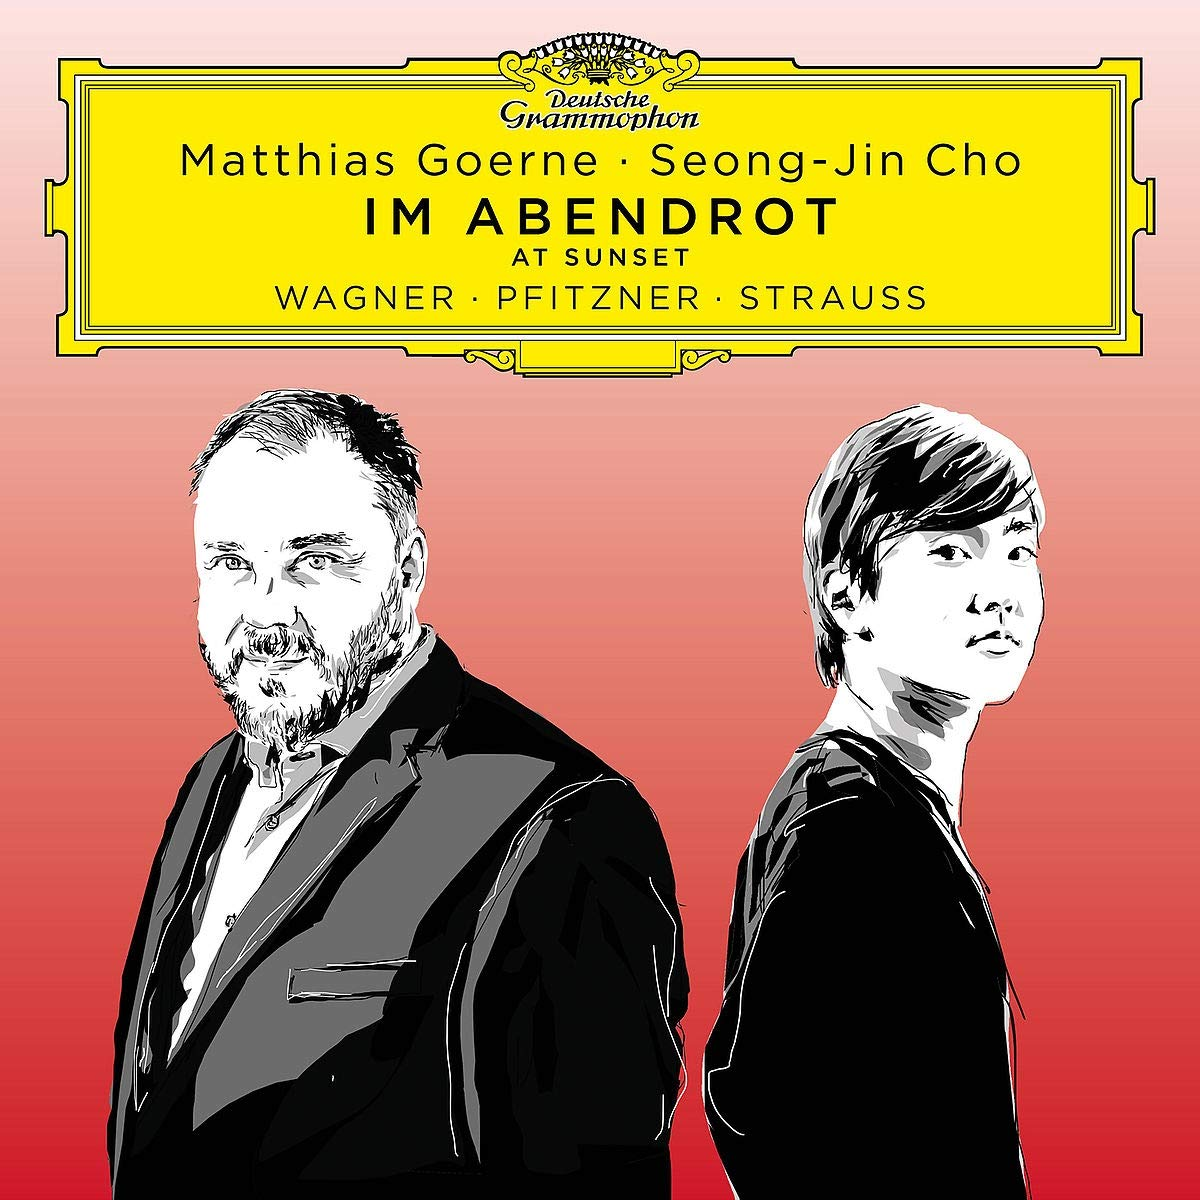 https://www.resmusica.com/wp-content/uploads/2021/04/Im-Abendrot_Wagner_Pfitzner_Strauss_Matthias-Goerne_Seong-Jin-Cho_Deutsche-Grammophon.jpg